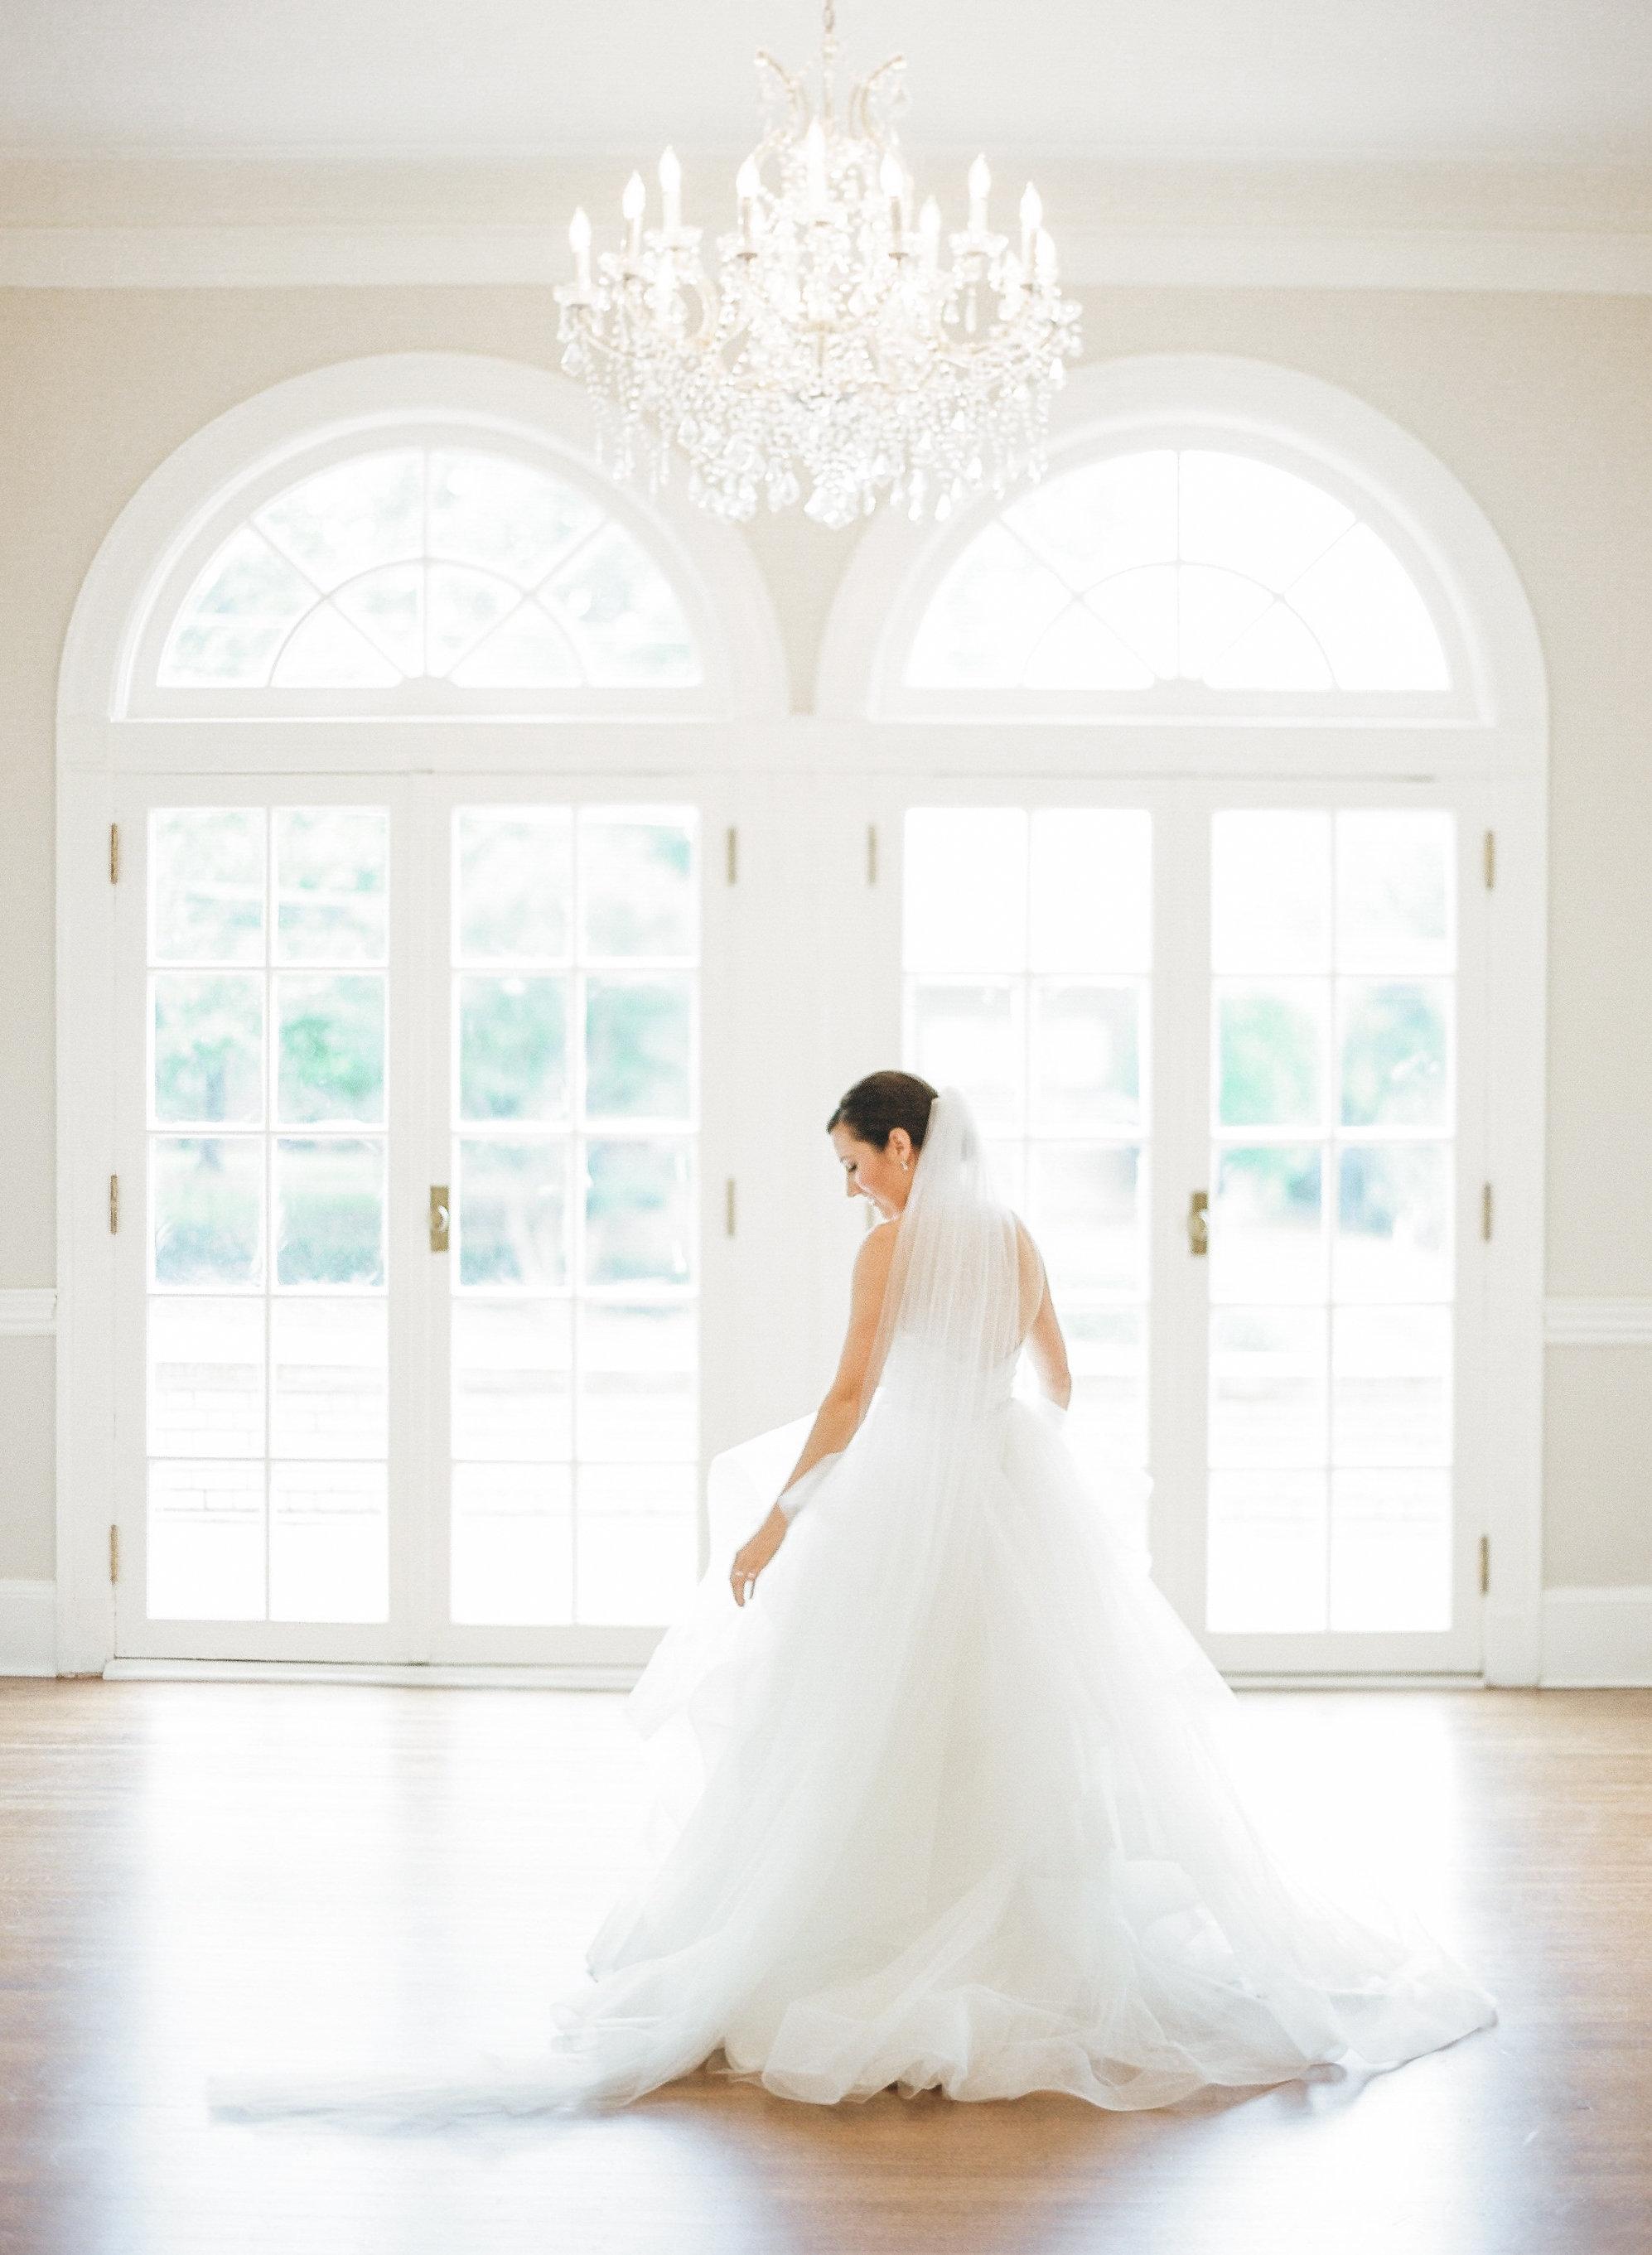 North-Carolina-Bridal-Photographer-Rebecca-8.jpg